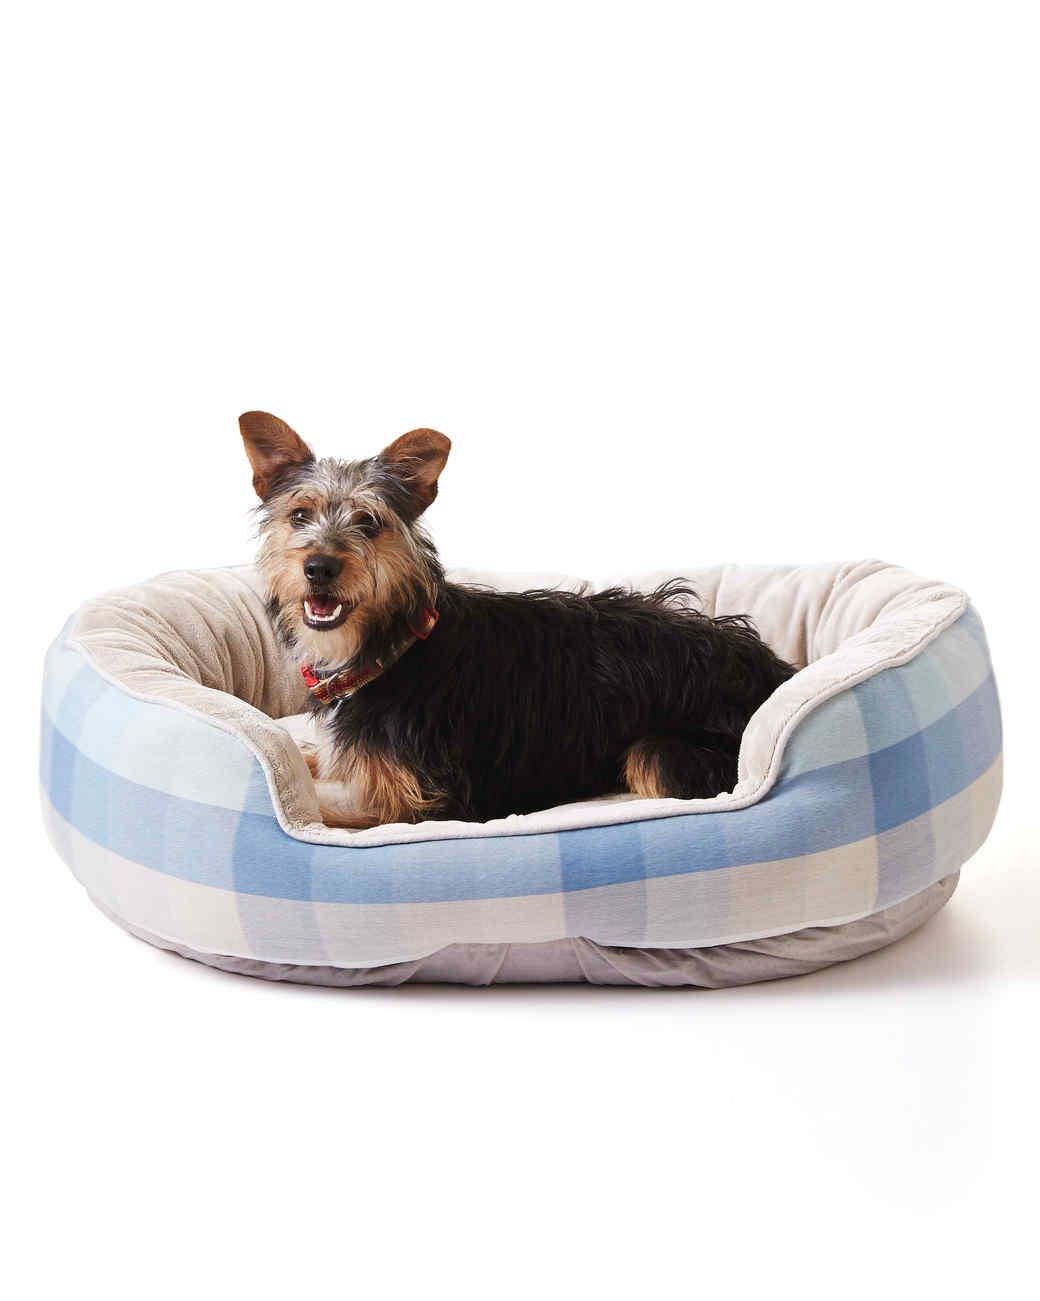 dog-bed-276-d111919.jpg